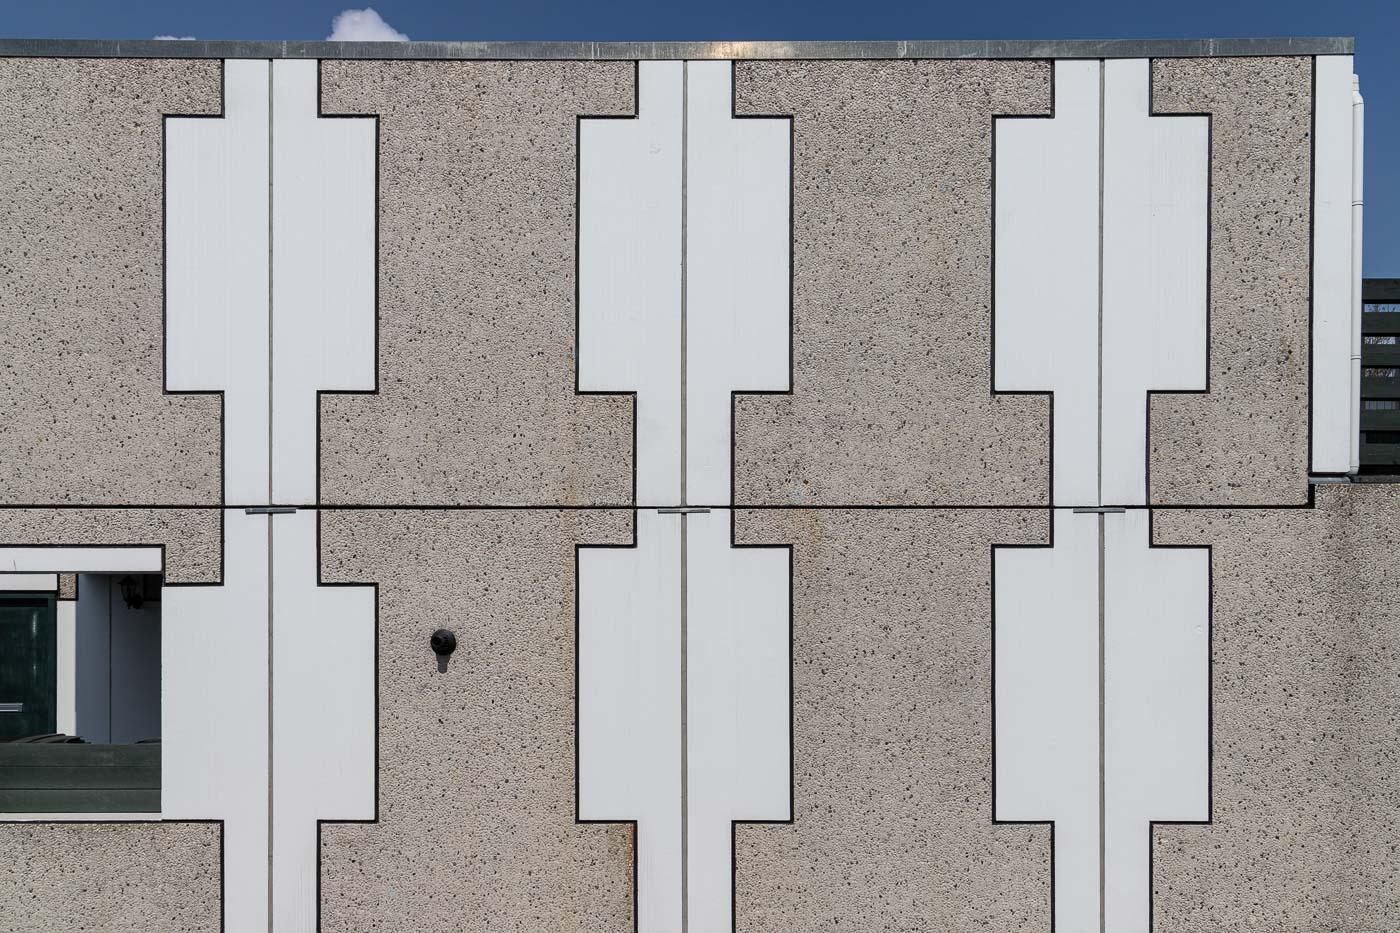 LEGO-woningen   Dordrecht   Nederland